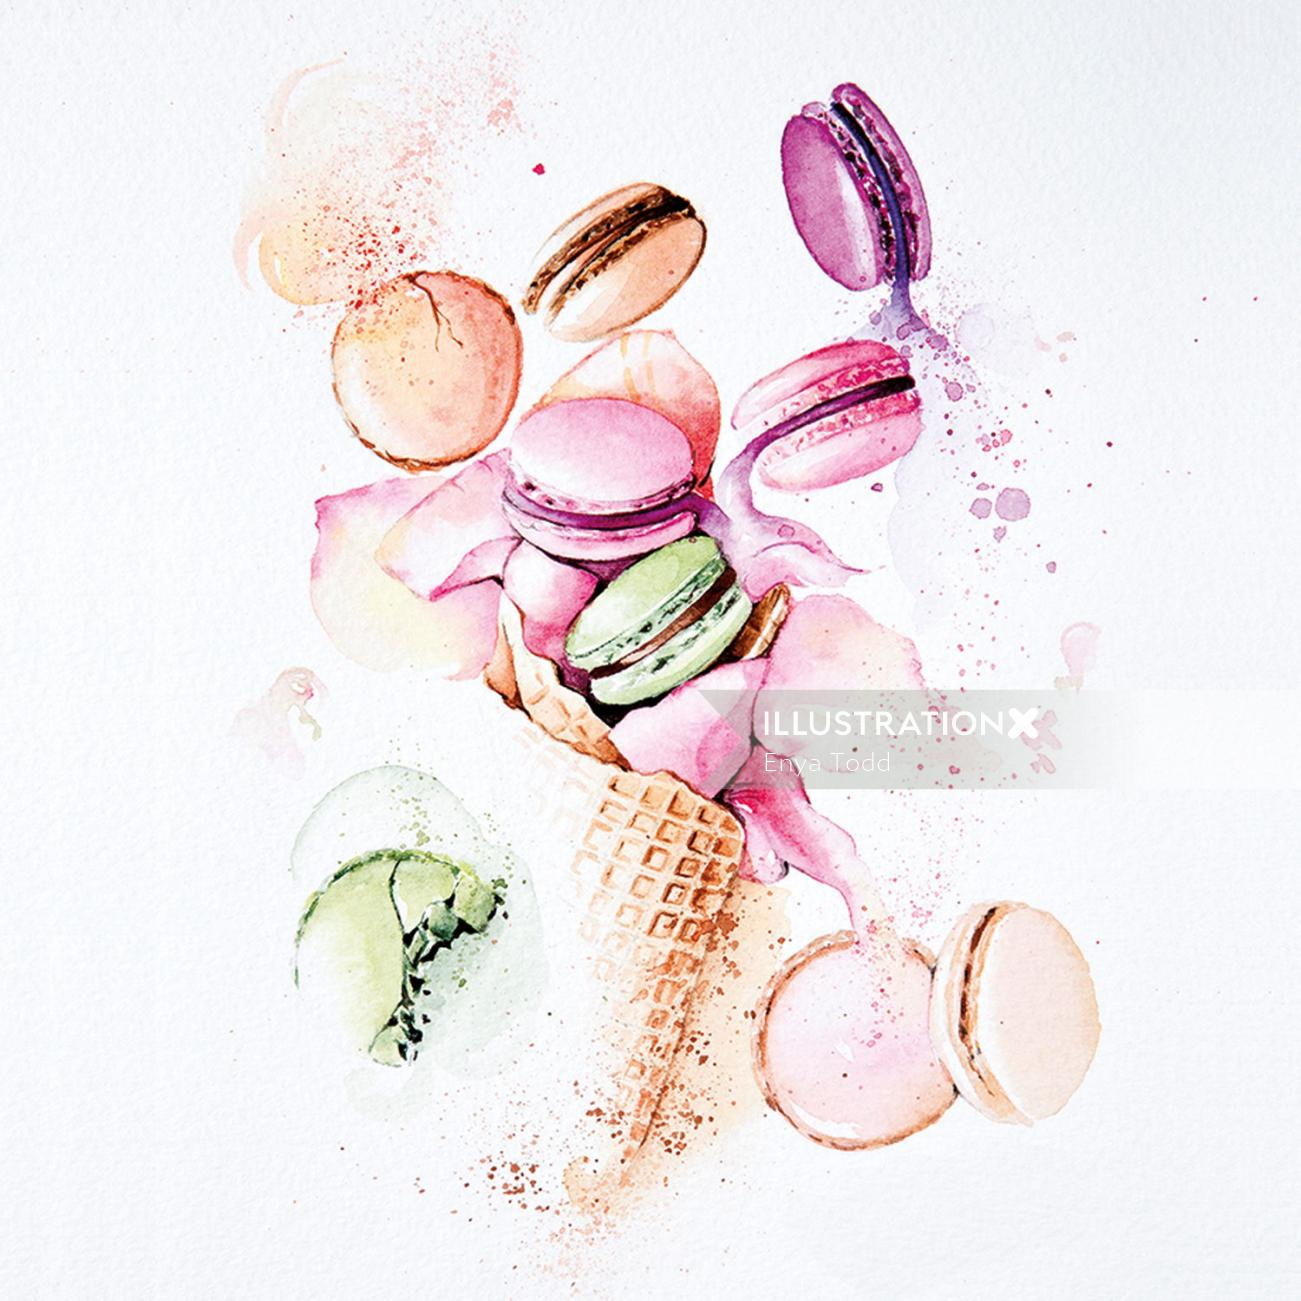 Watercolour artwork of macaron ice cream